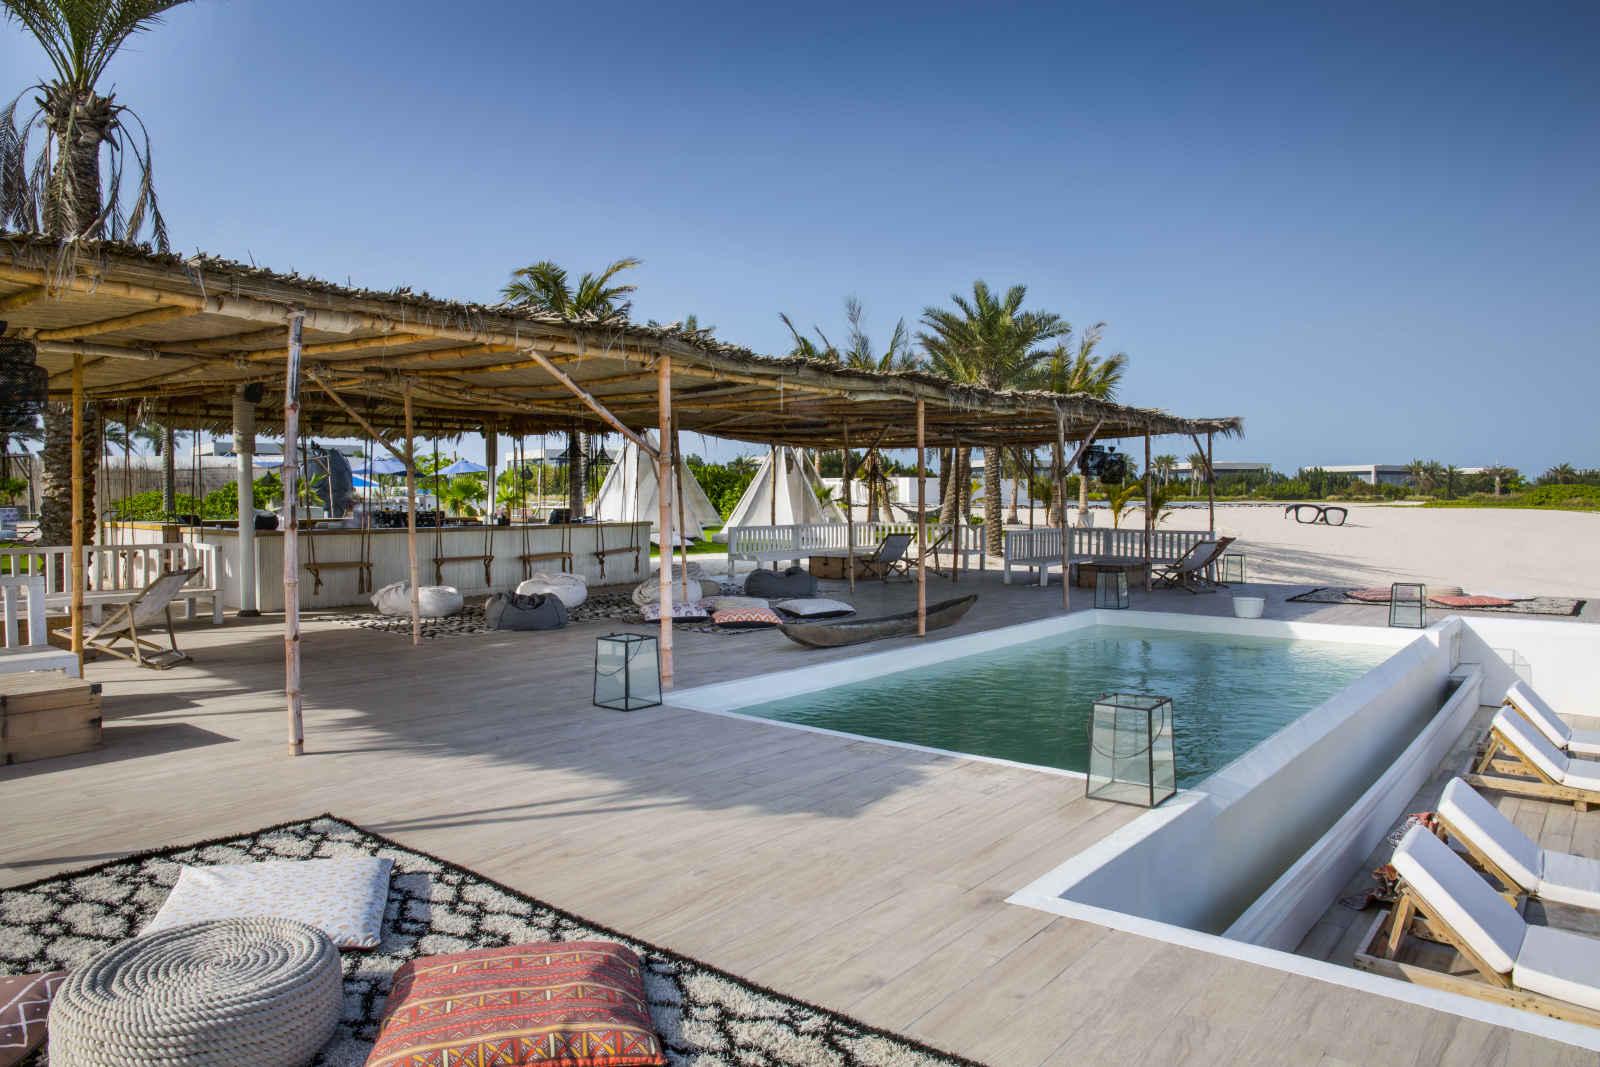 Abou Dhabi : Zaya Nurai Island